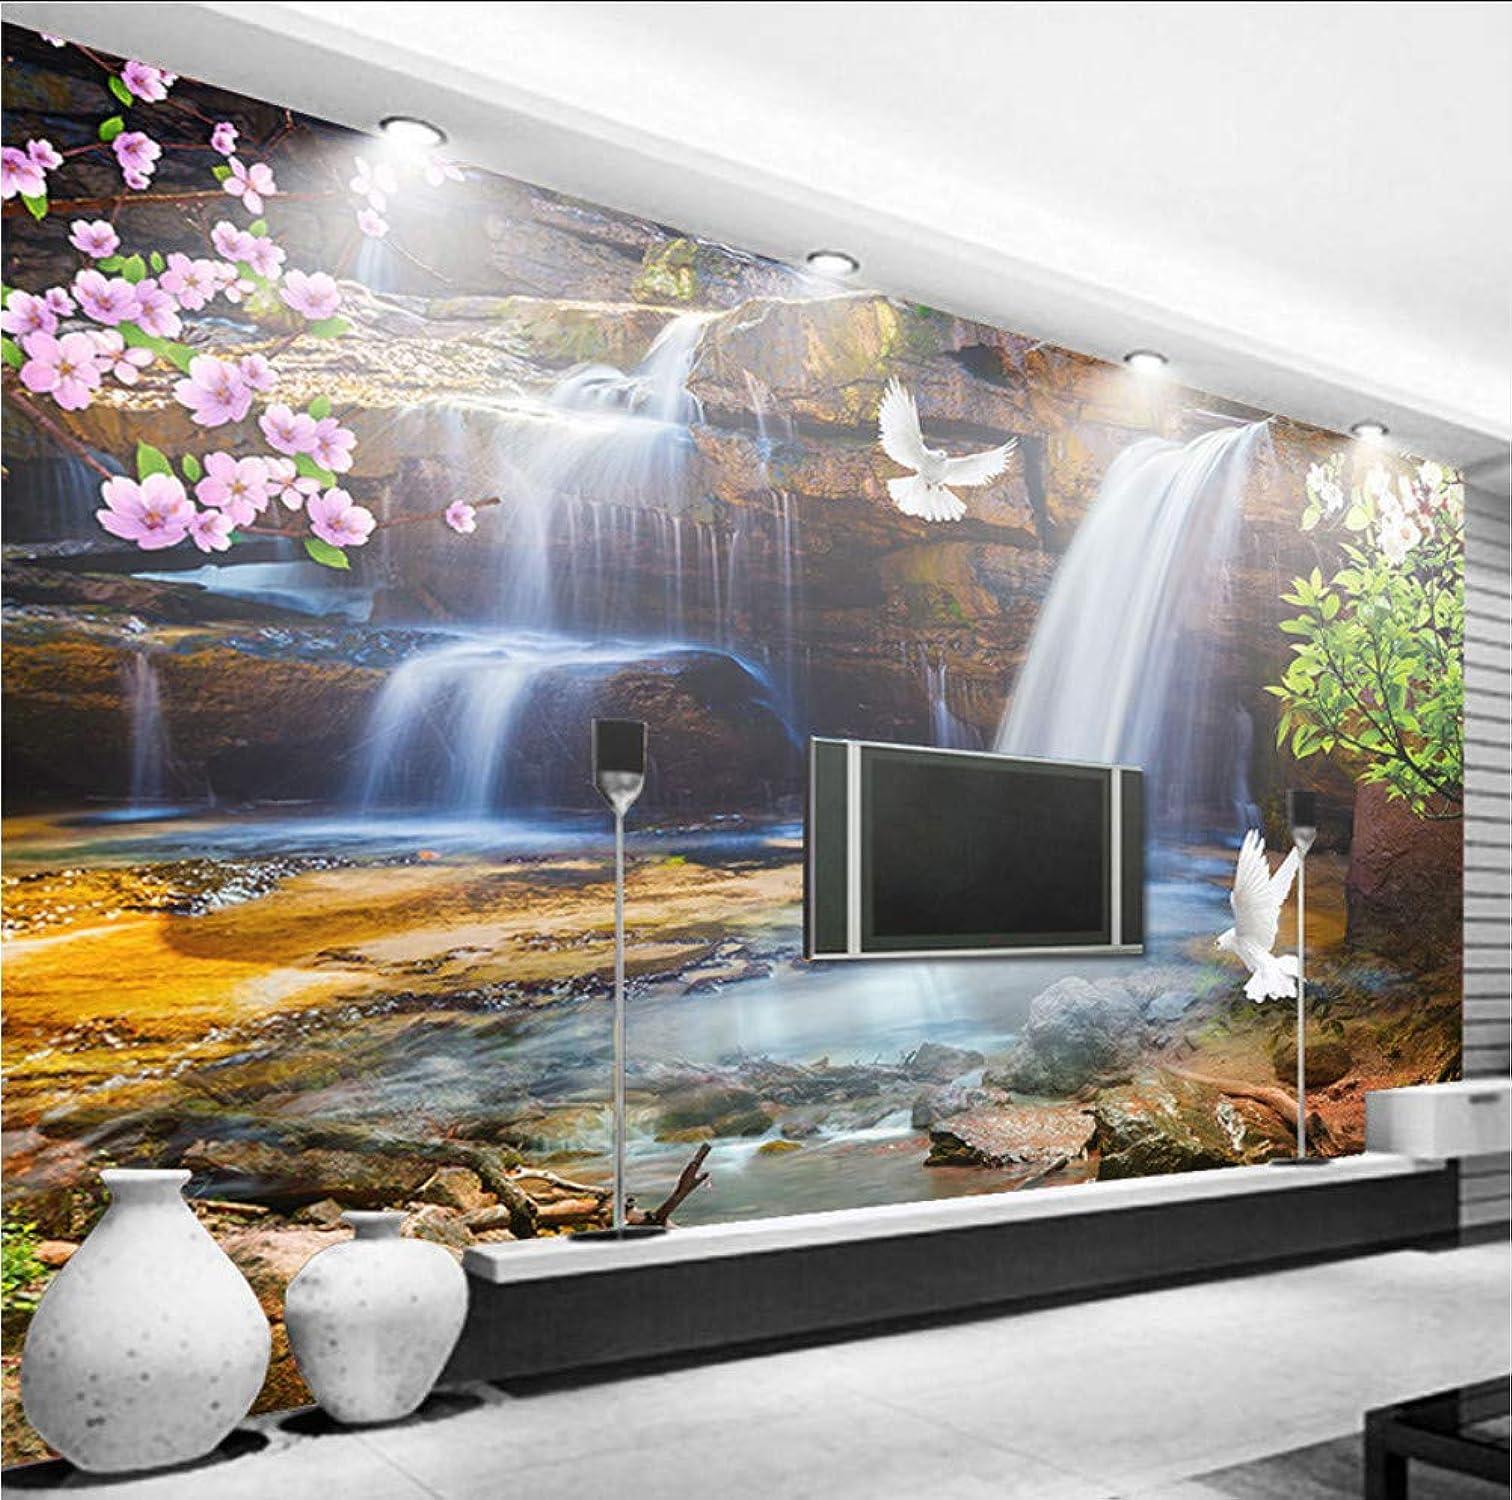 100% autentico Mural Papel Papel Papel Pintado 3D Personalizado Para Parojoes Rollo Cascada Agua Corriente Paisaje Natural Mural Grande 3D Foto Papel TapizDormitorio-200X140CM  genuina alta calidad